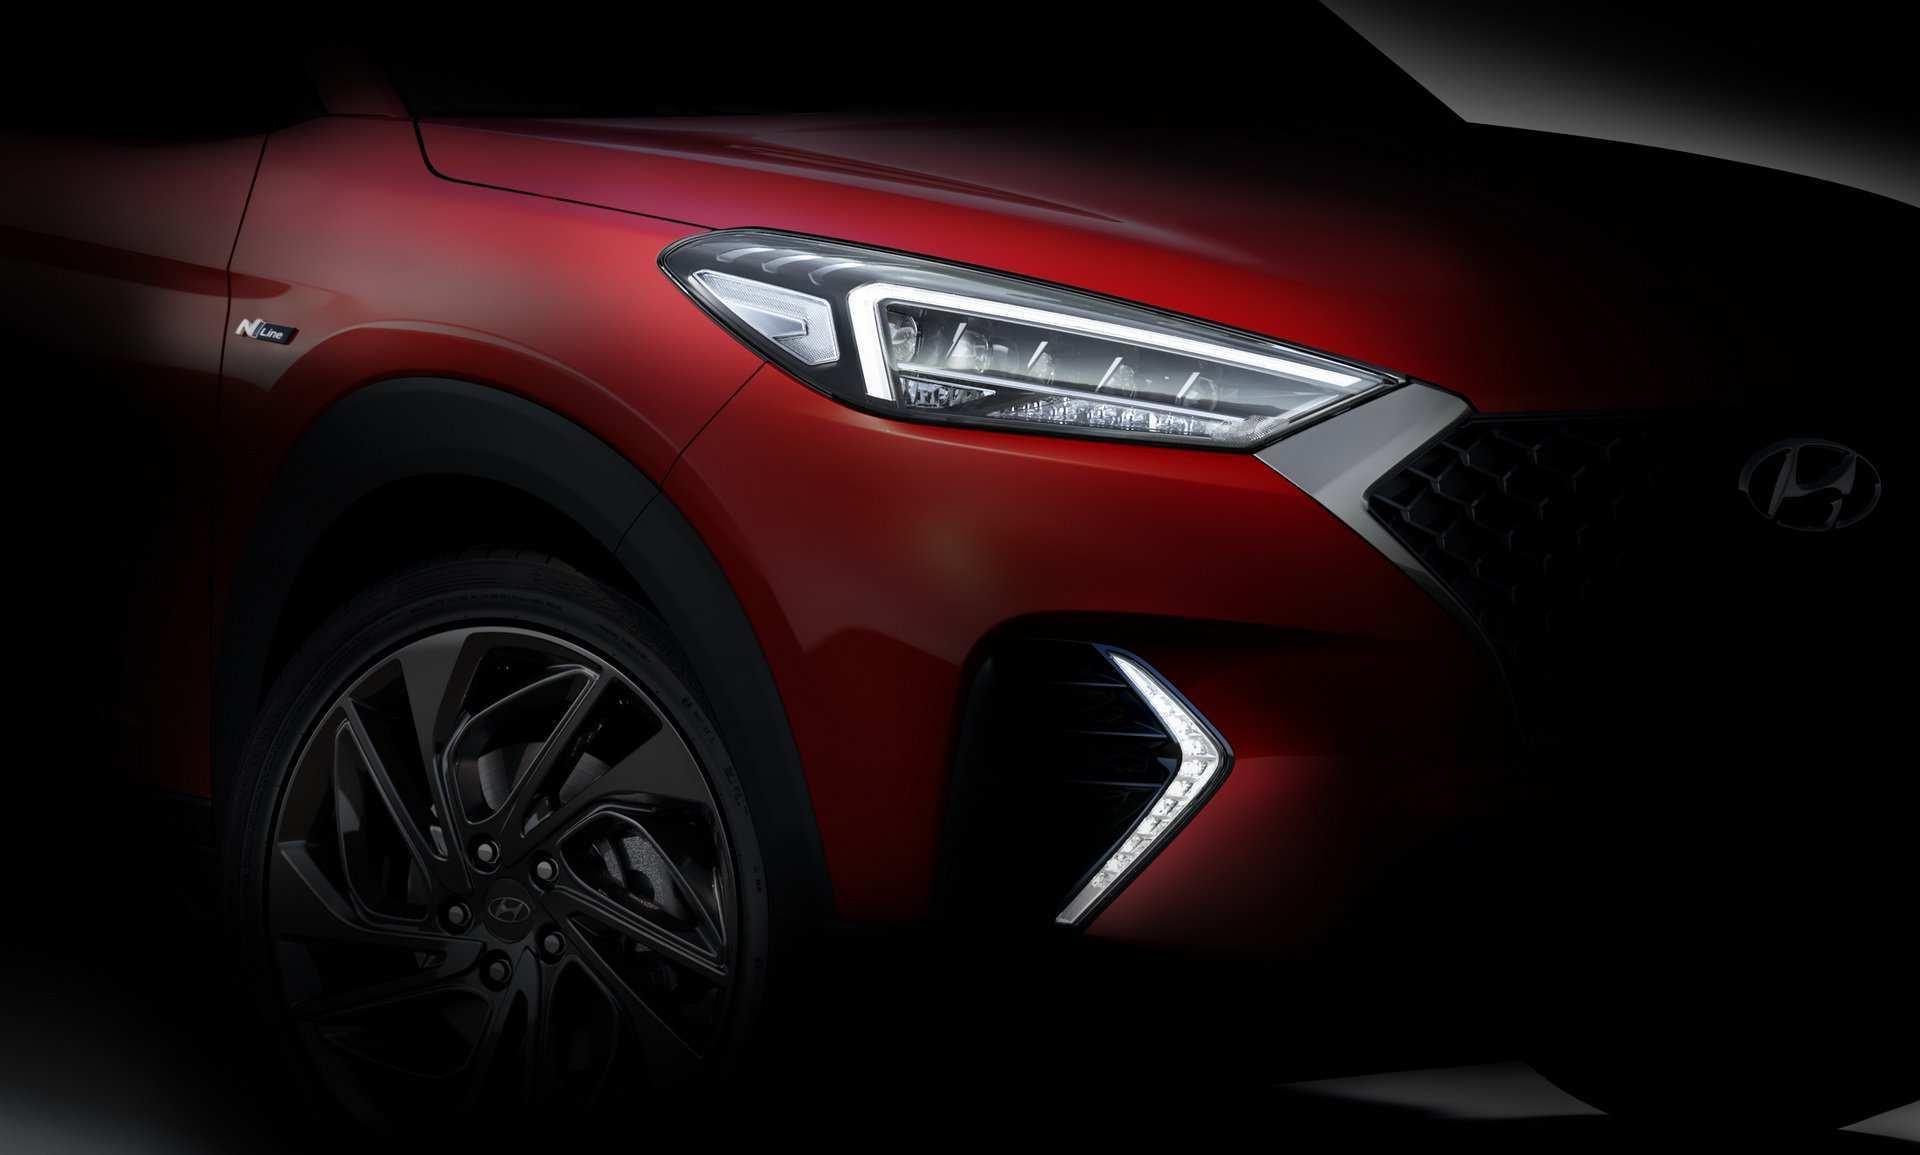 74 Best Review Hyundai Diesel 2020 New Review with Hyundai Diesel 2020